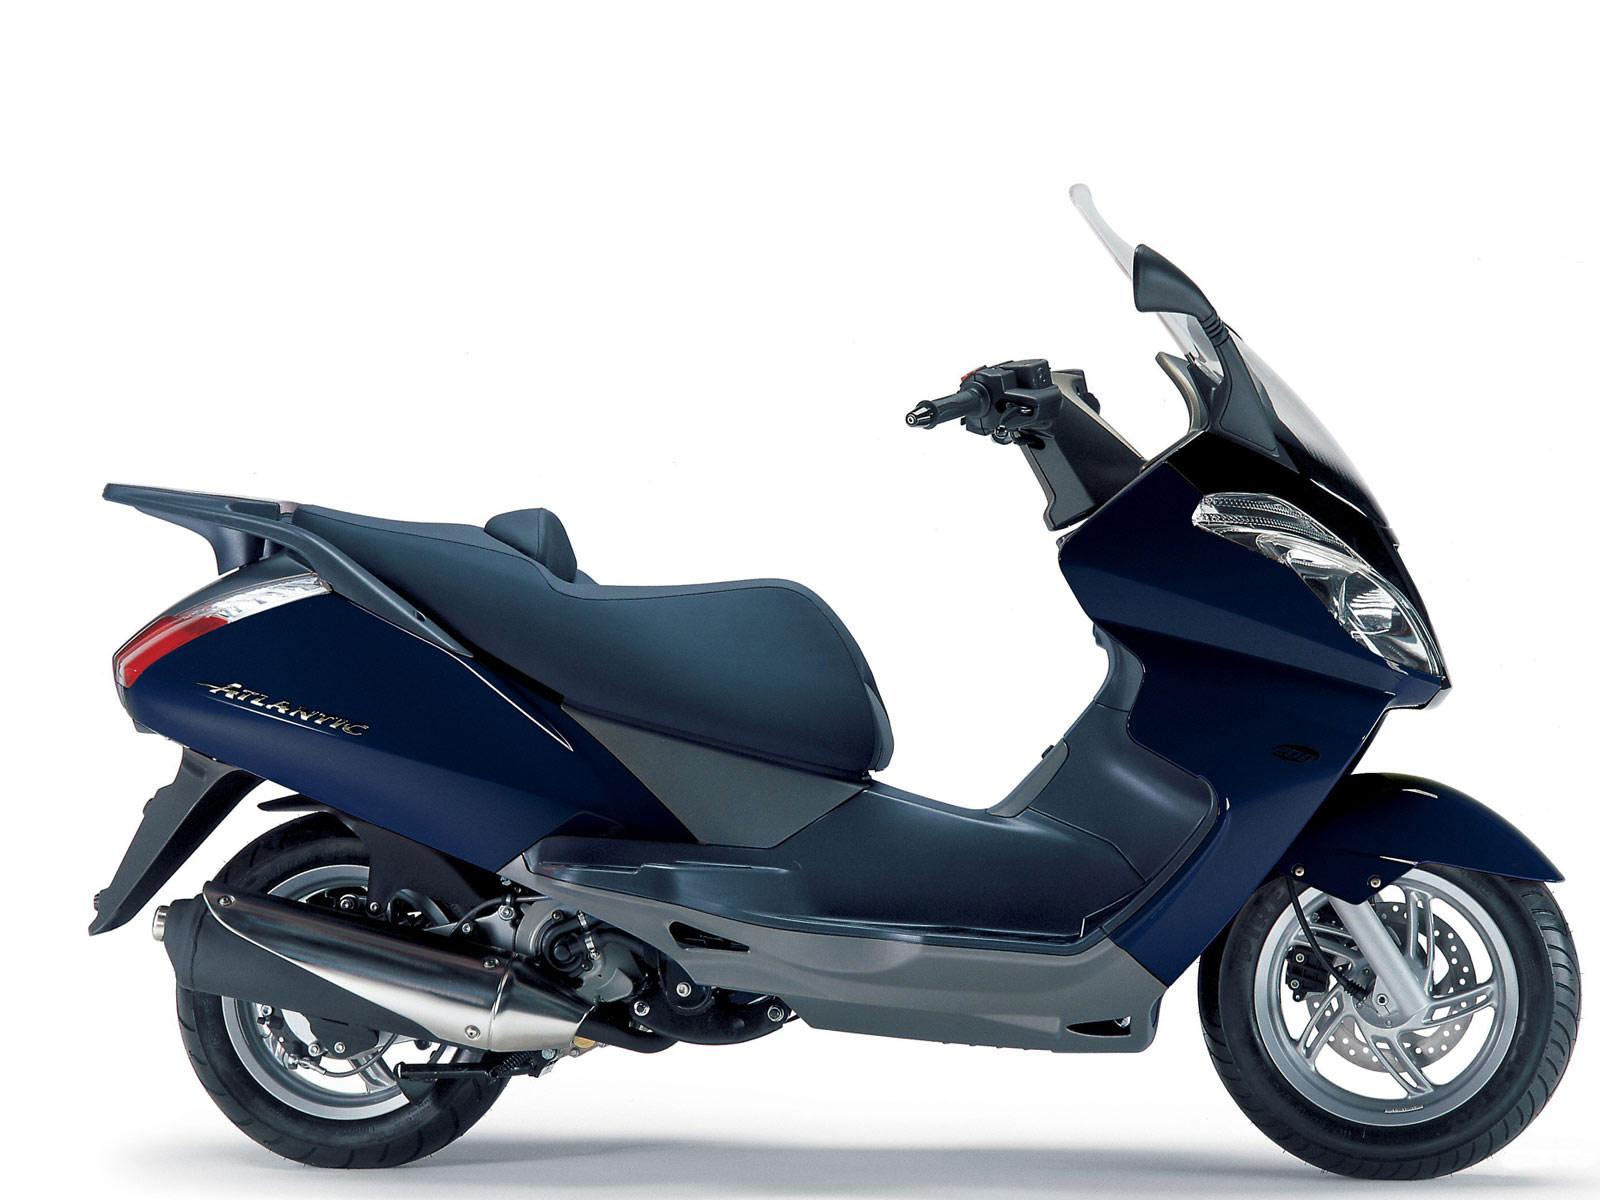 2005 aprilia atlantic 125 scooter pictures insurance info. Black Bedroom Furniture Sets. Home Design Ideas